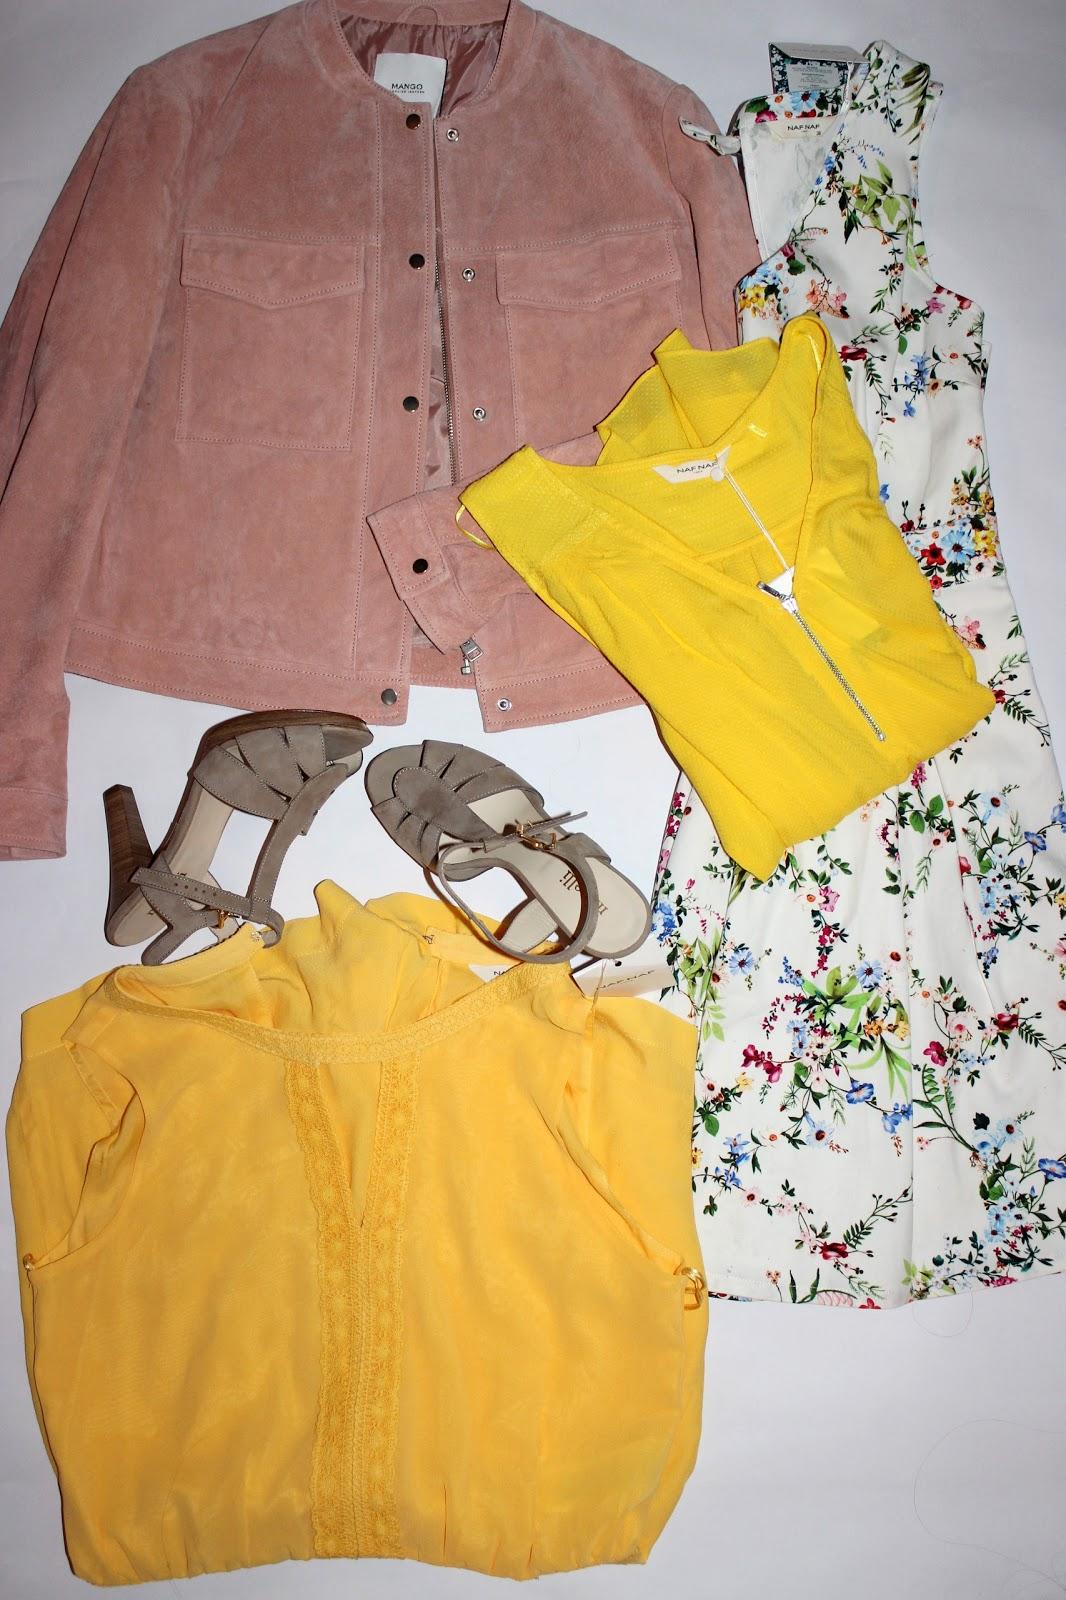 Blouson daim rose mango, robe à fleurs naf naf, combi short jaune, sandales